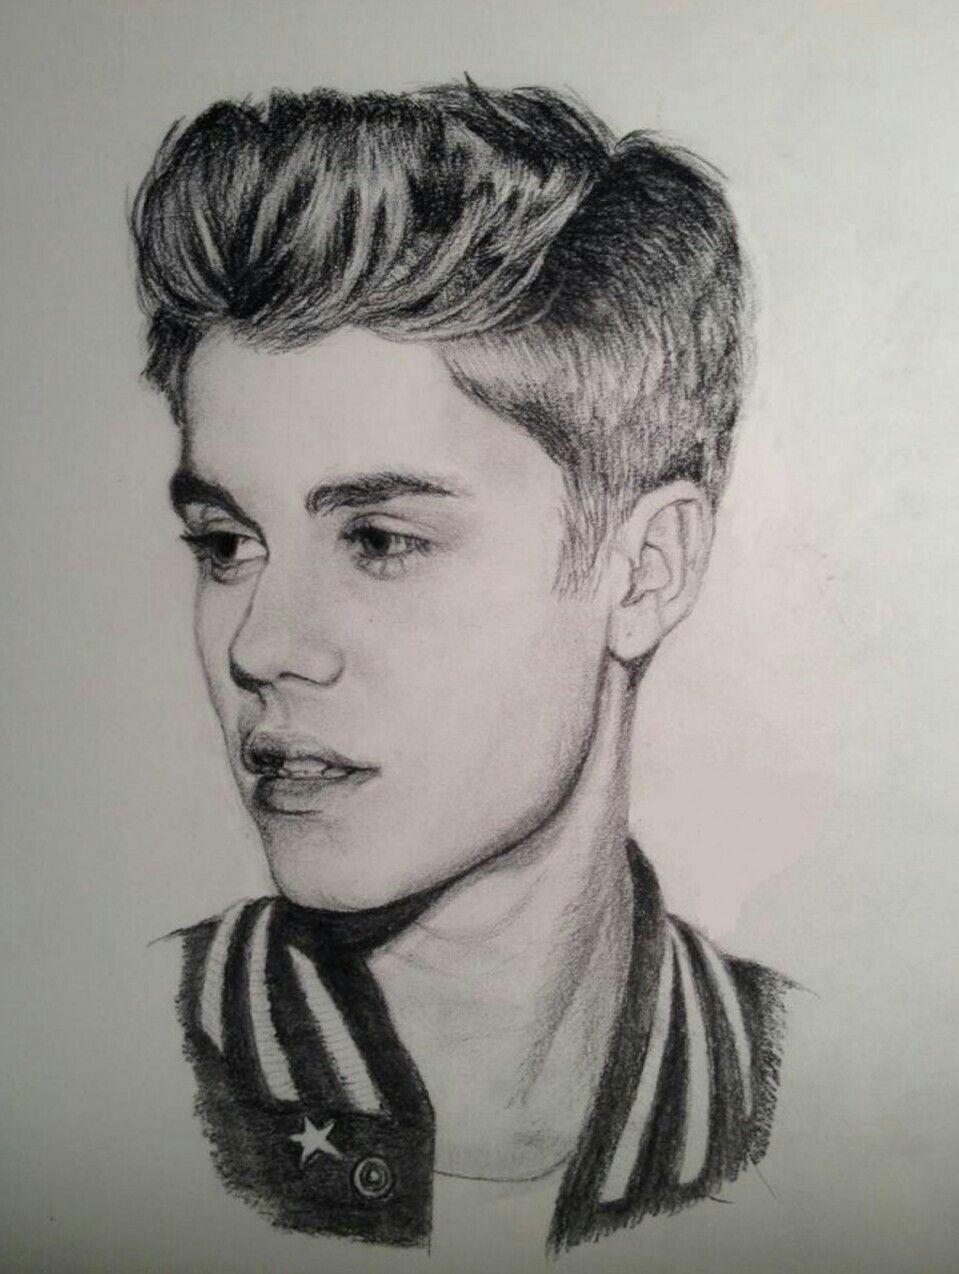 Justin Bieber Jb Mejores Dibujos A Lapiz Artistas Dibujos Simples Tumblr